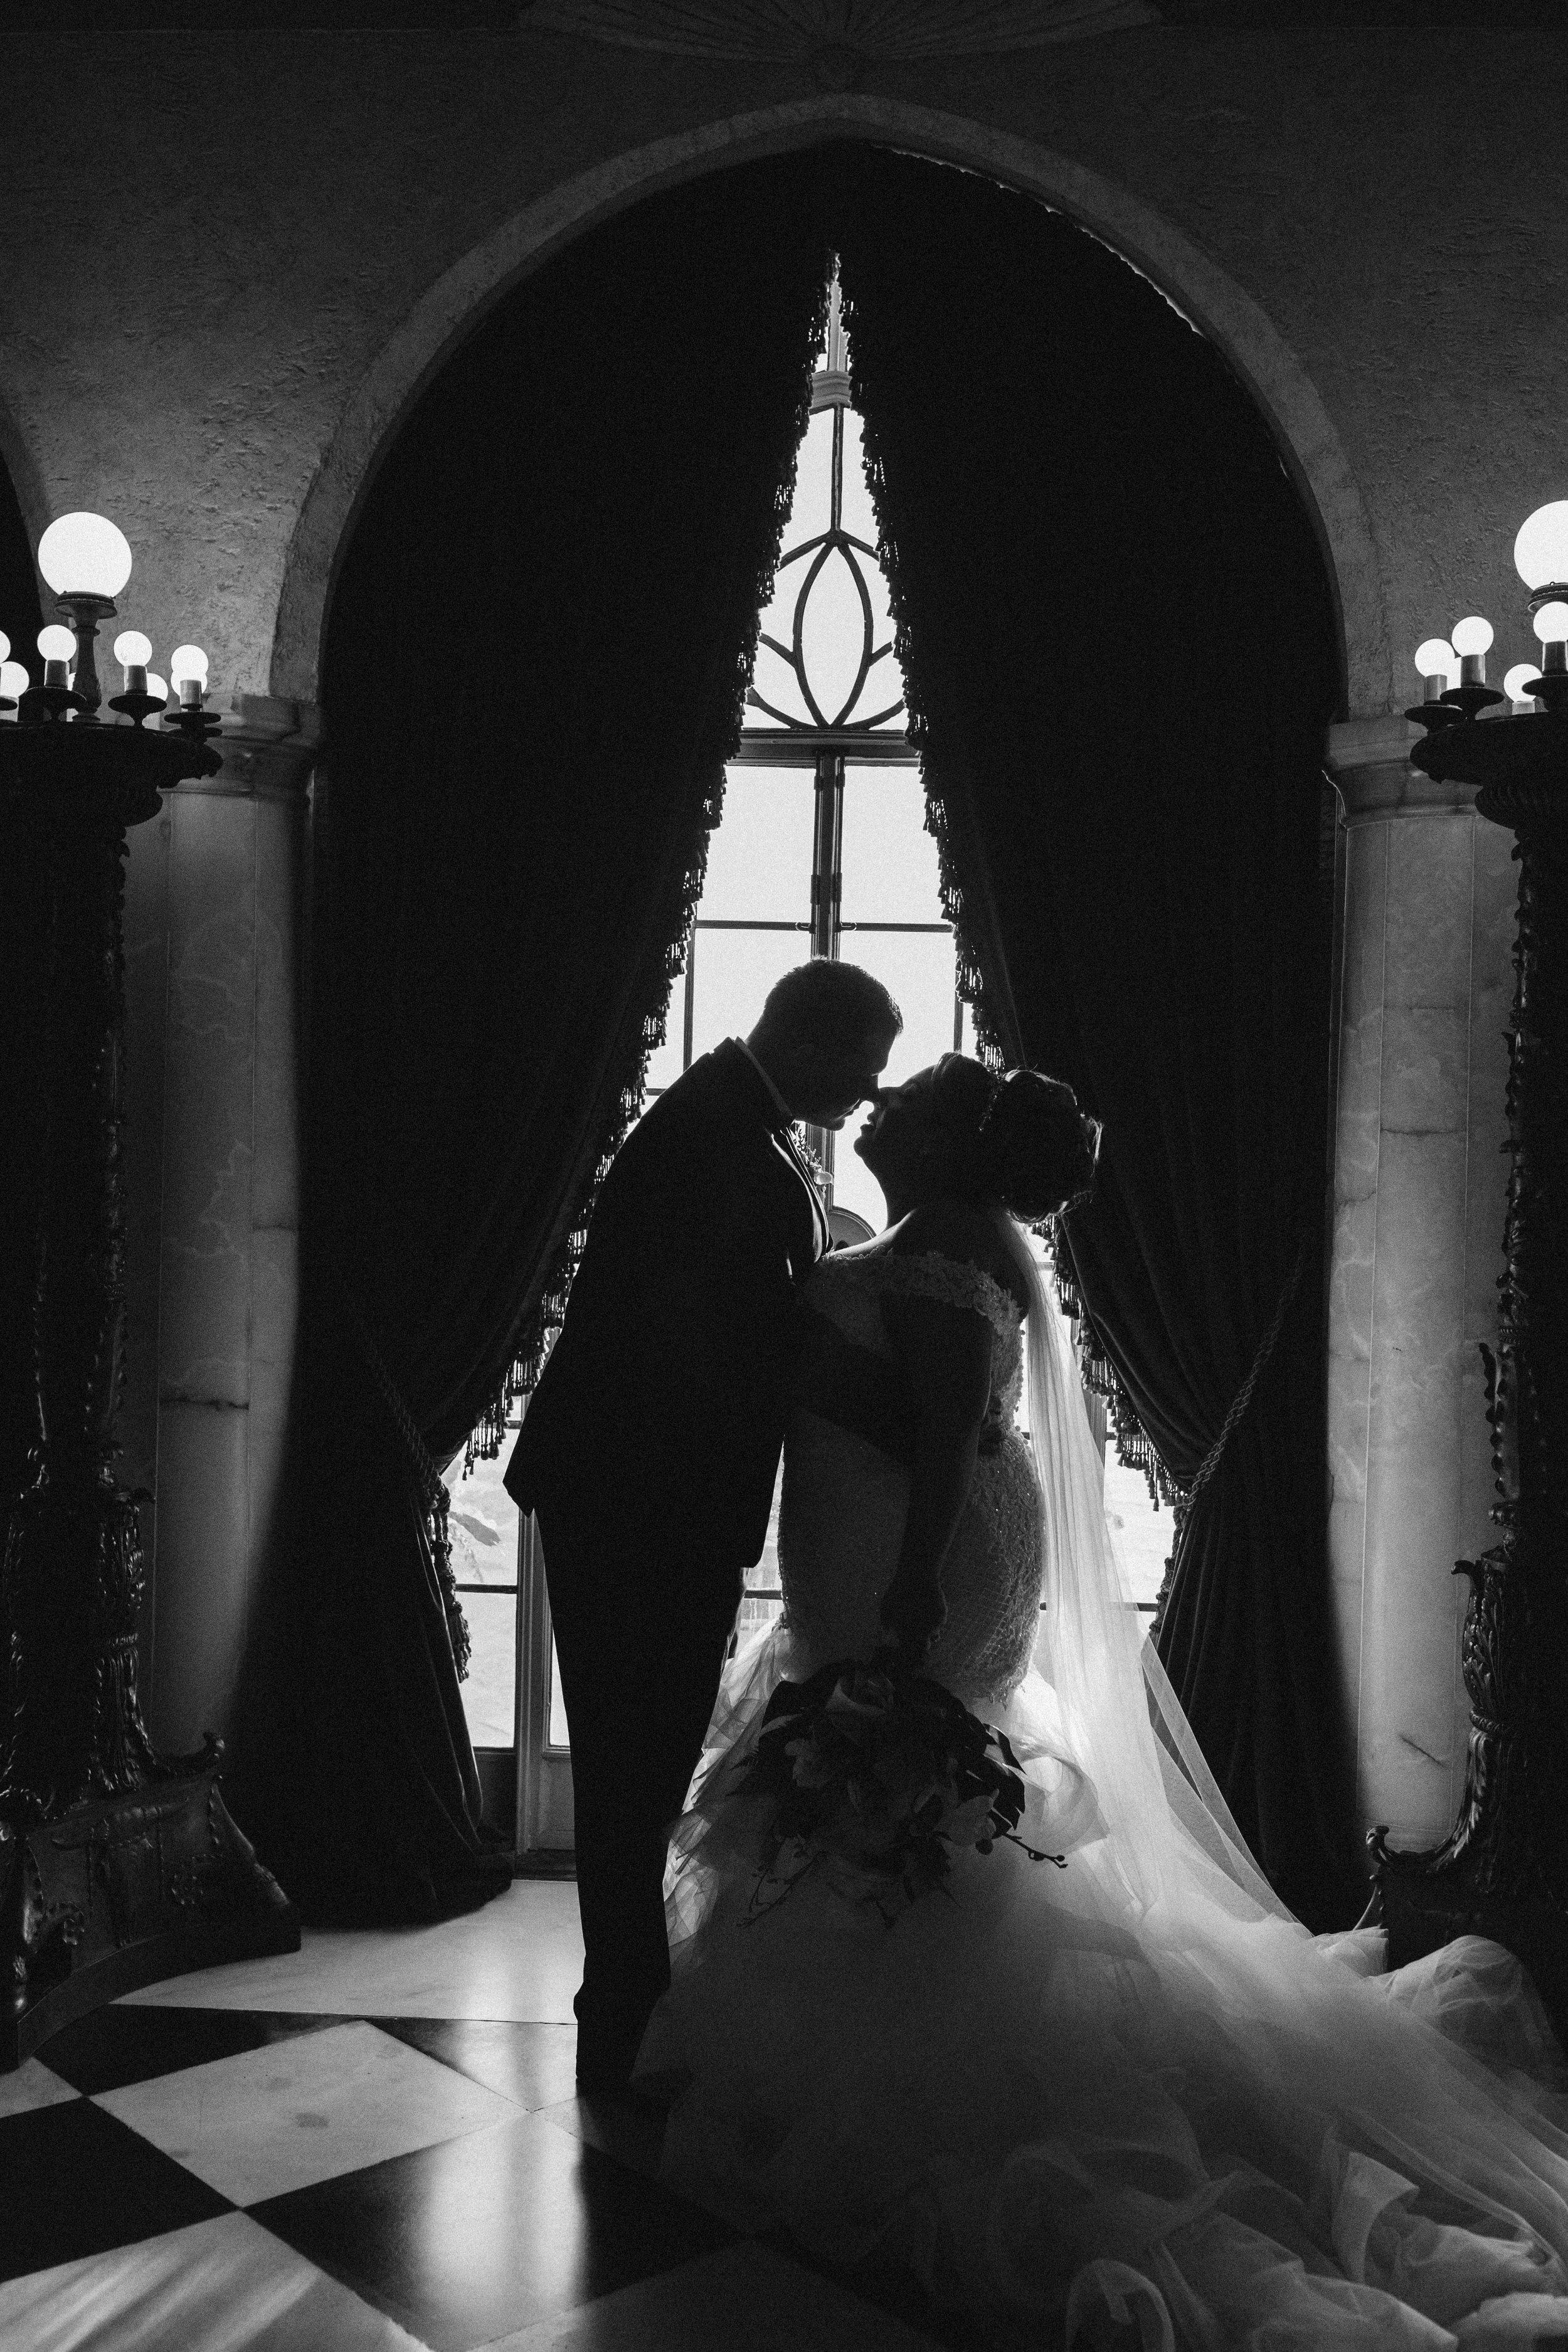 Ringling Museum Sarasota Florida-Wedding-Bianca and Michael94.JPG